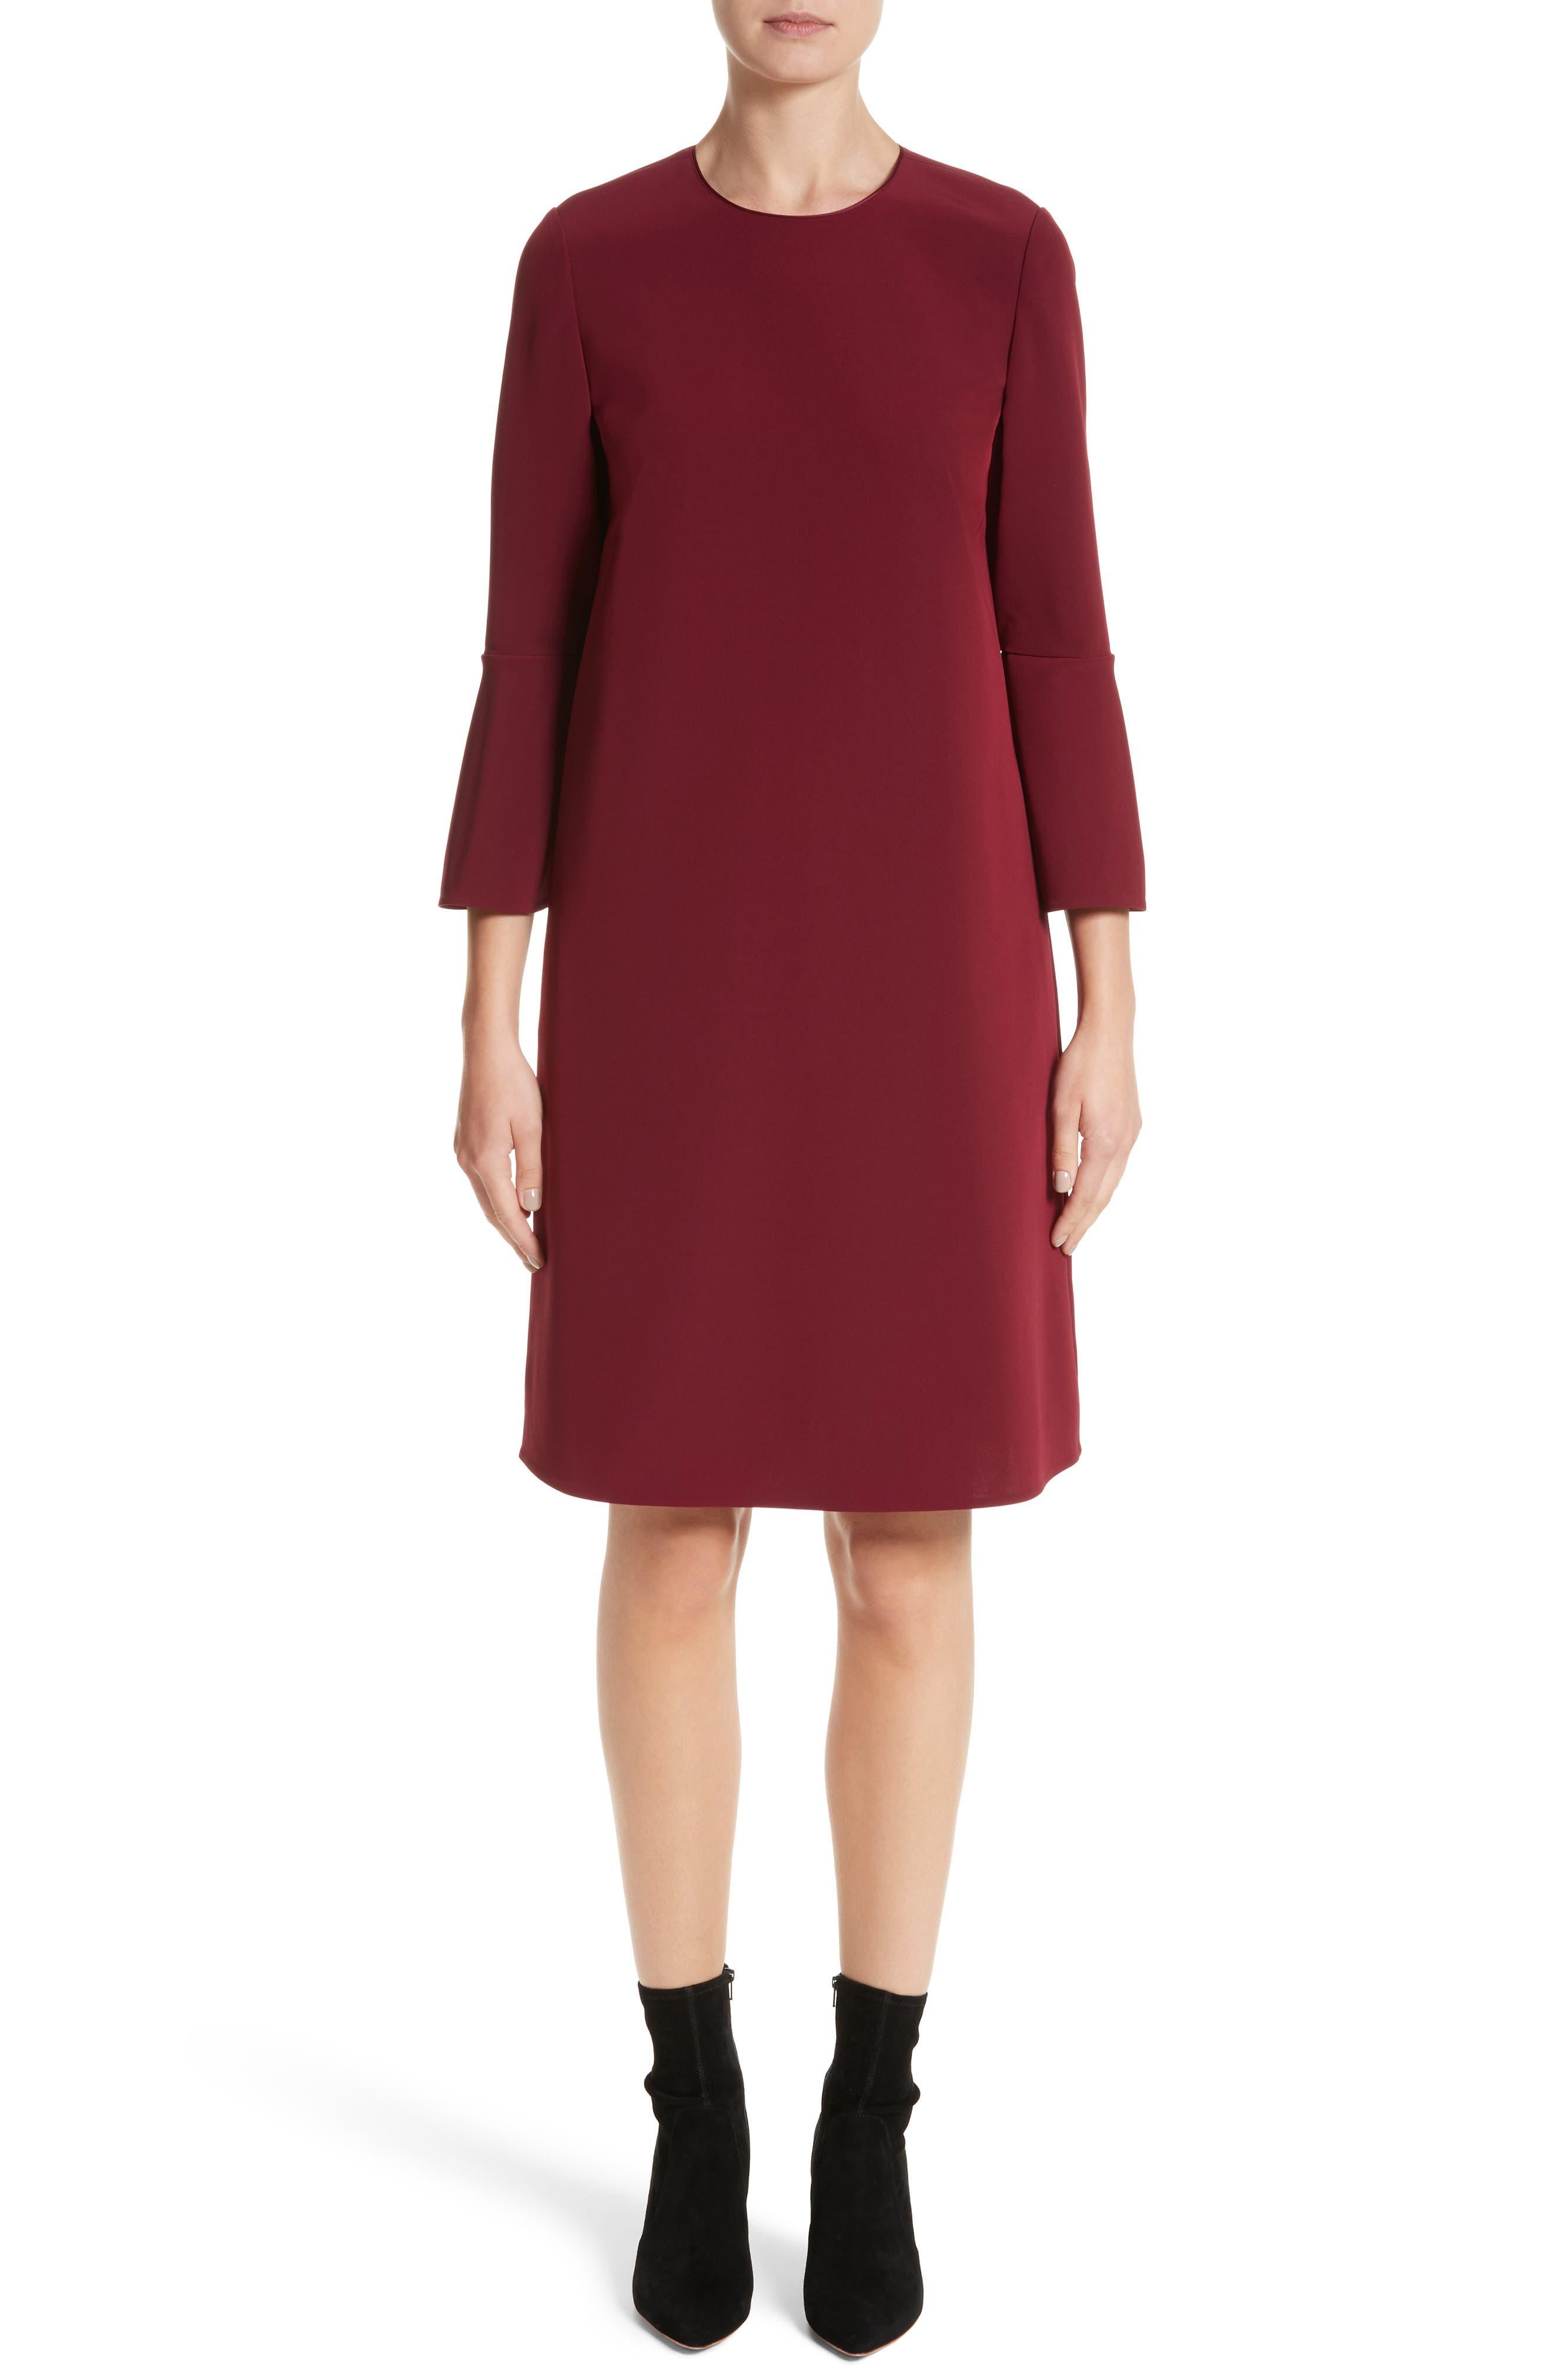 Sidra Emory Cloth Dress,                         Main,                         color, 930